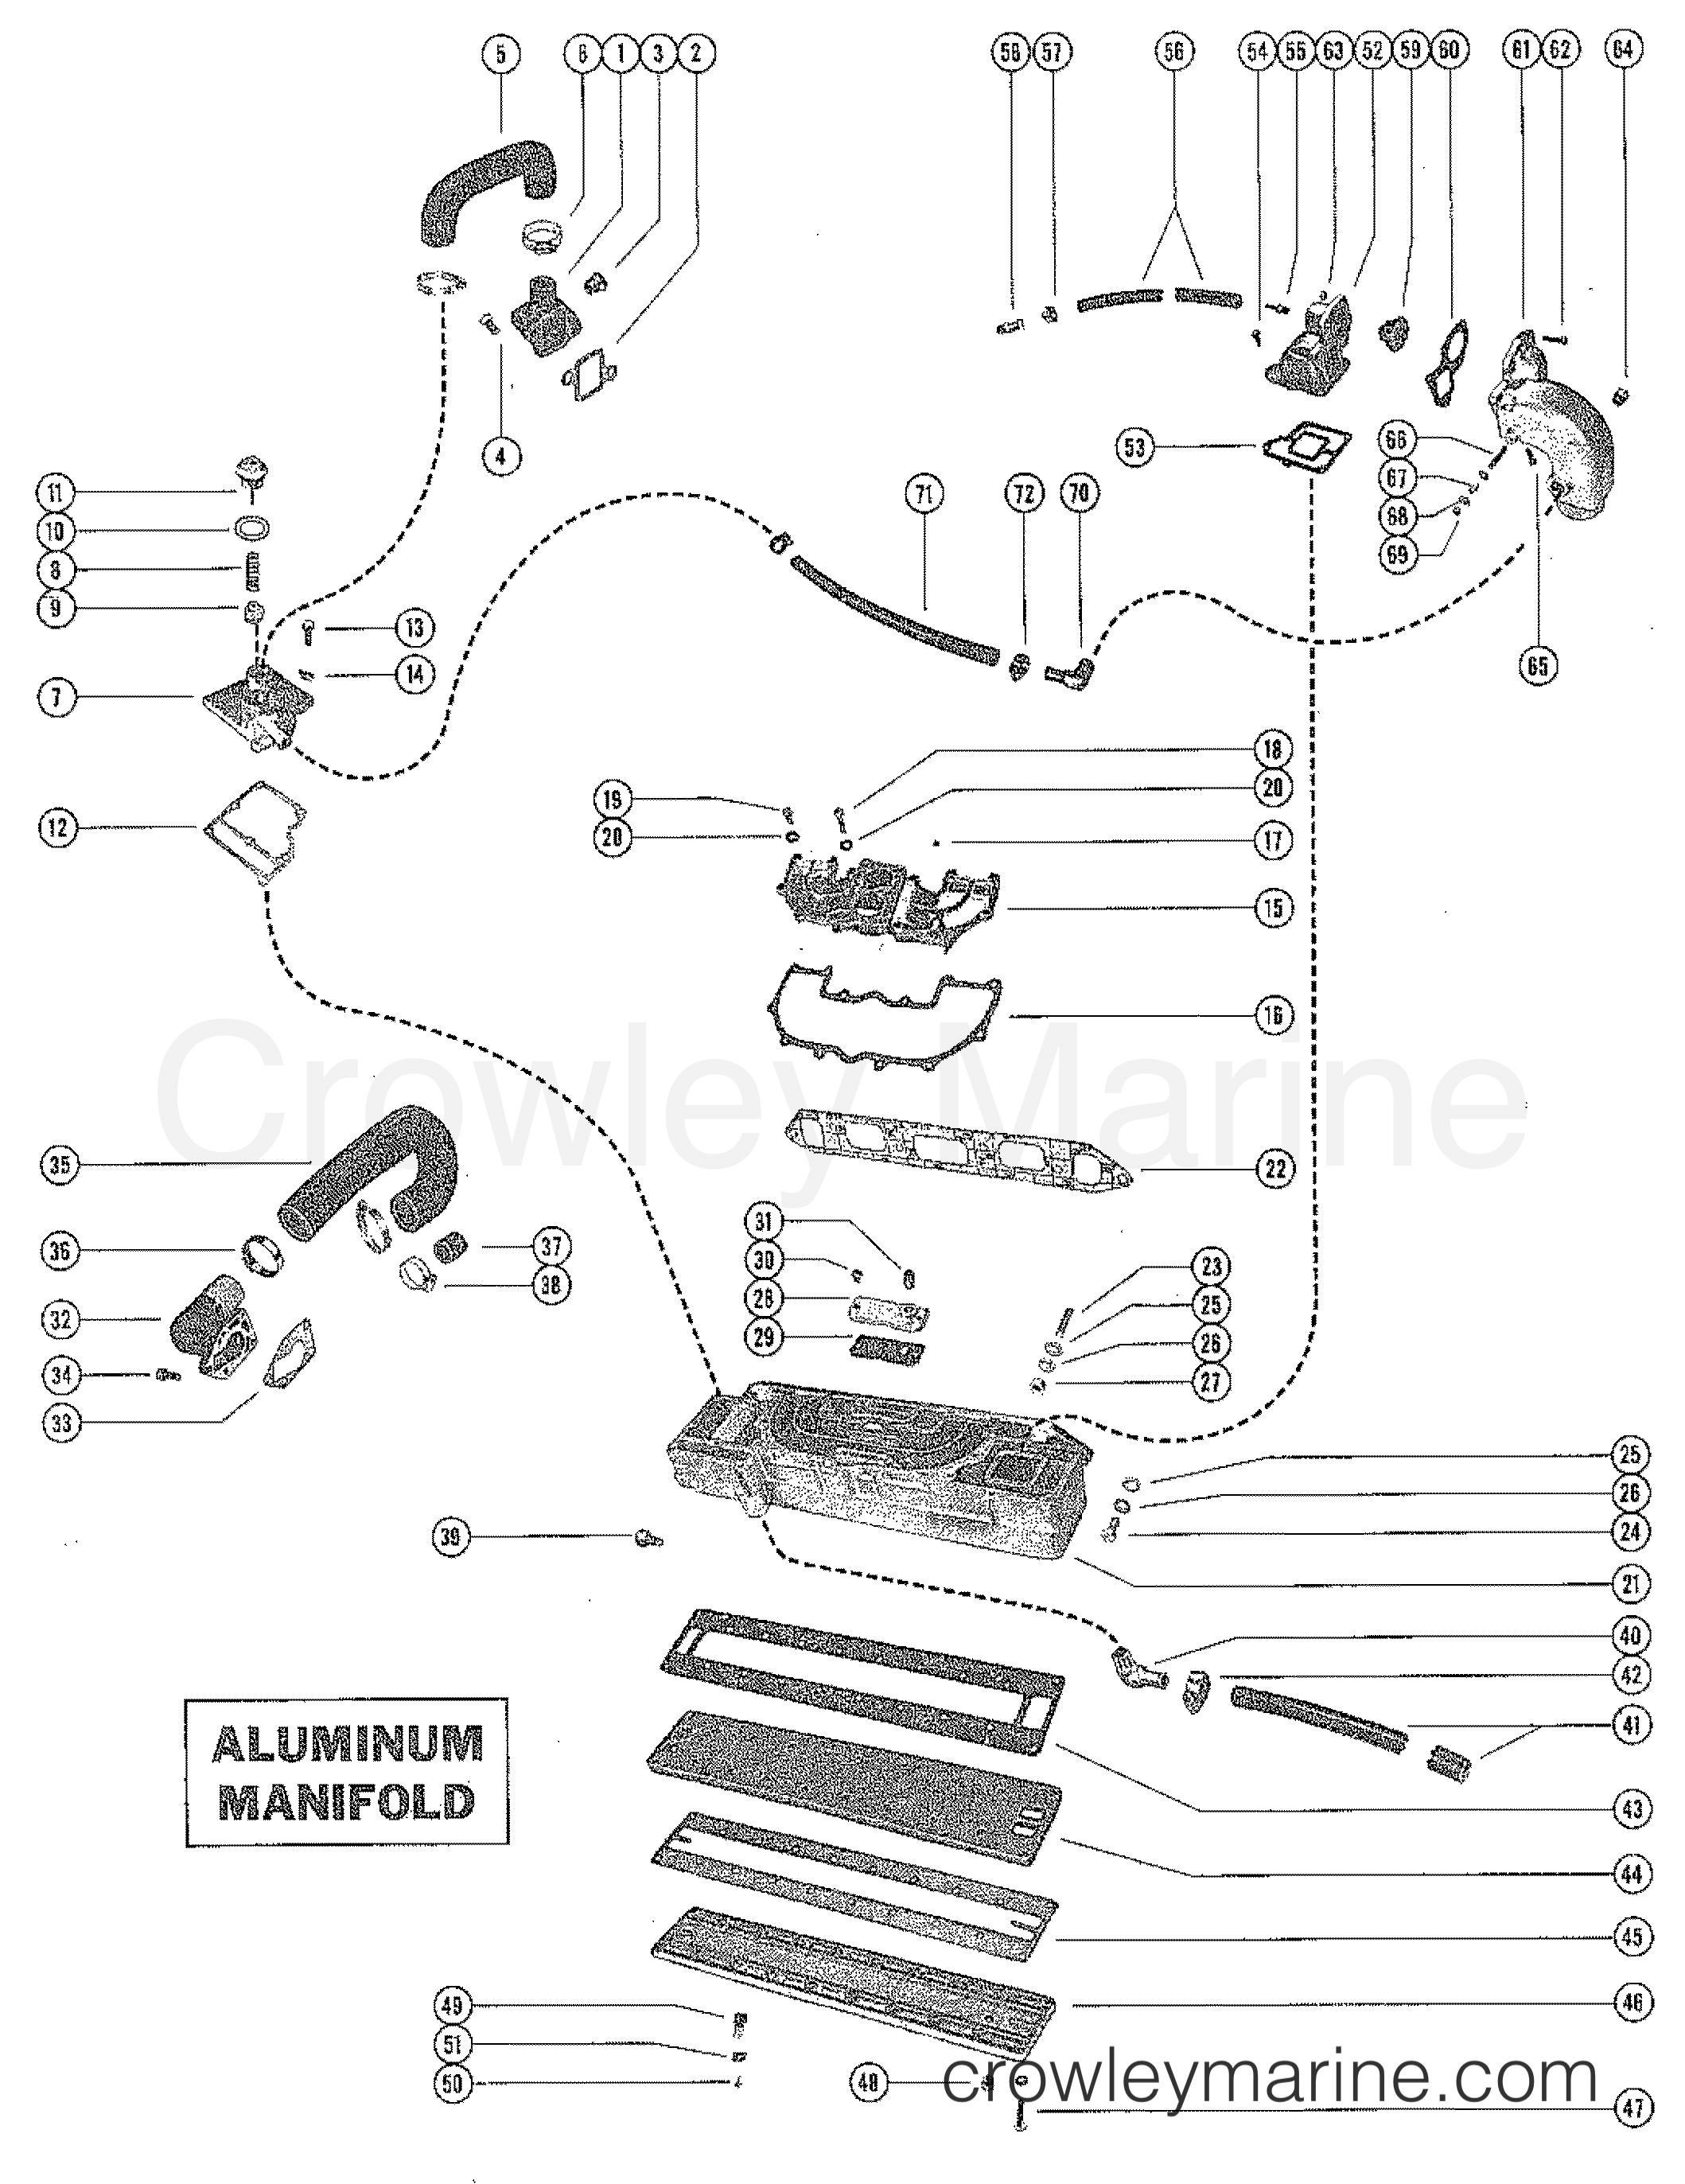 serial range mercruiser 120 gm 153 i/l4 1964-1972 - 1666601 thru 3377340